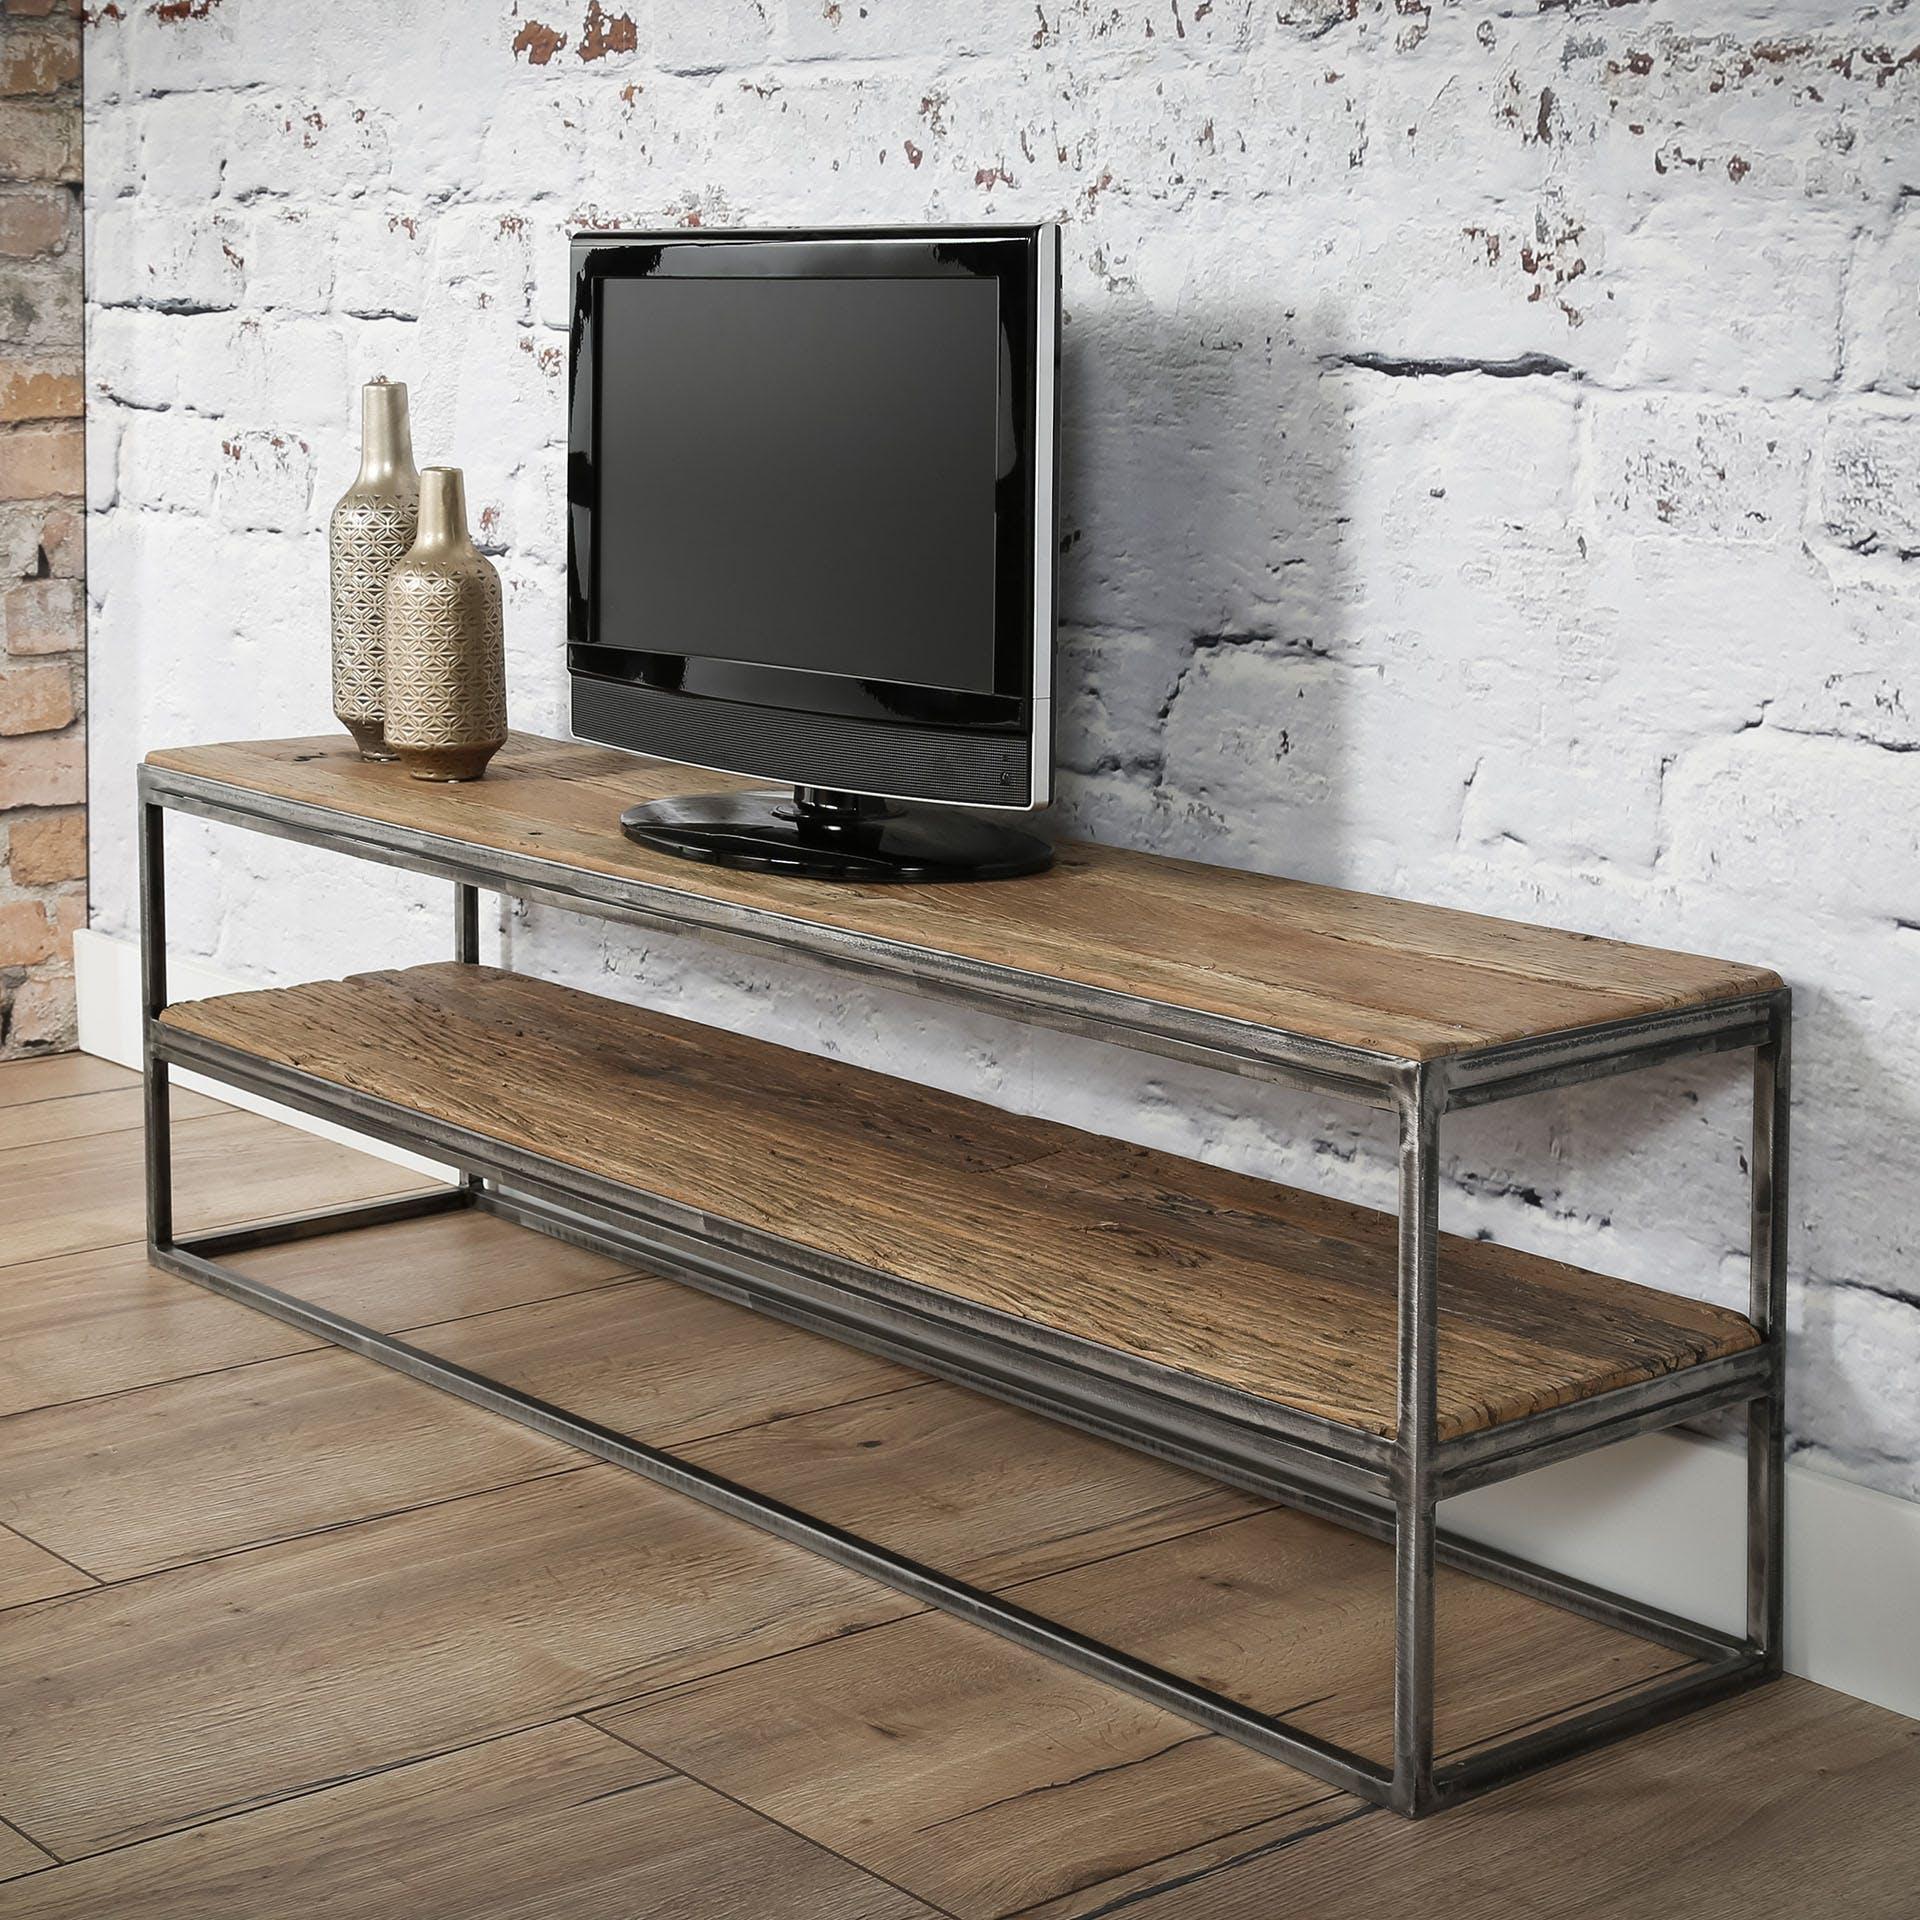 Meuble TV bois brut recyclé métal OMSK